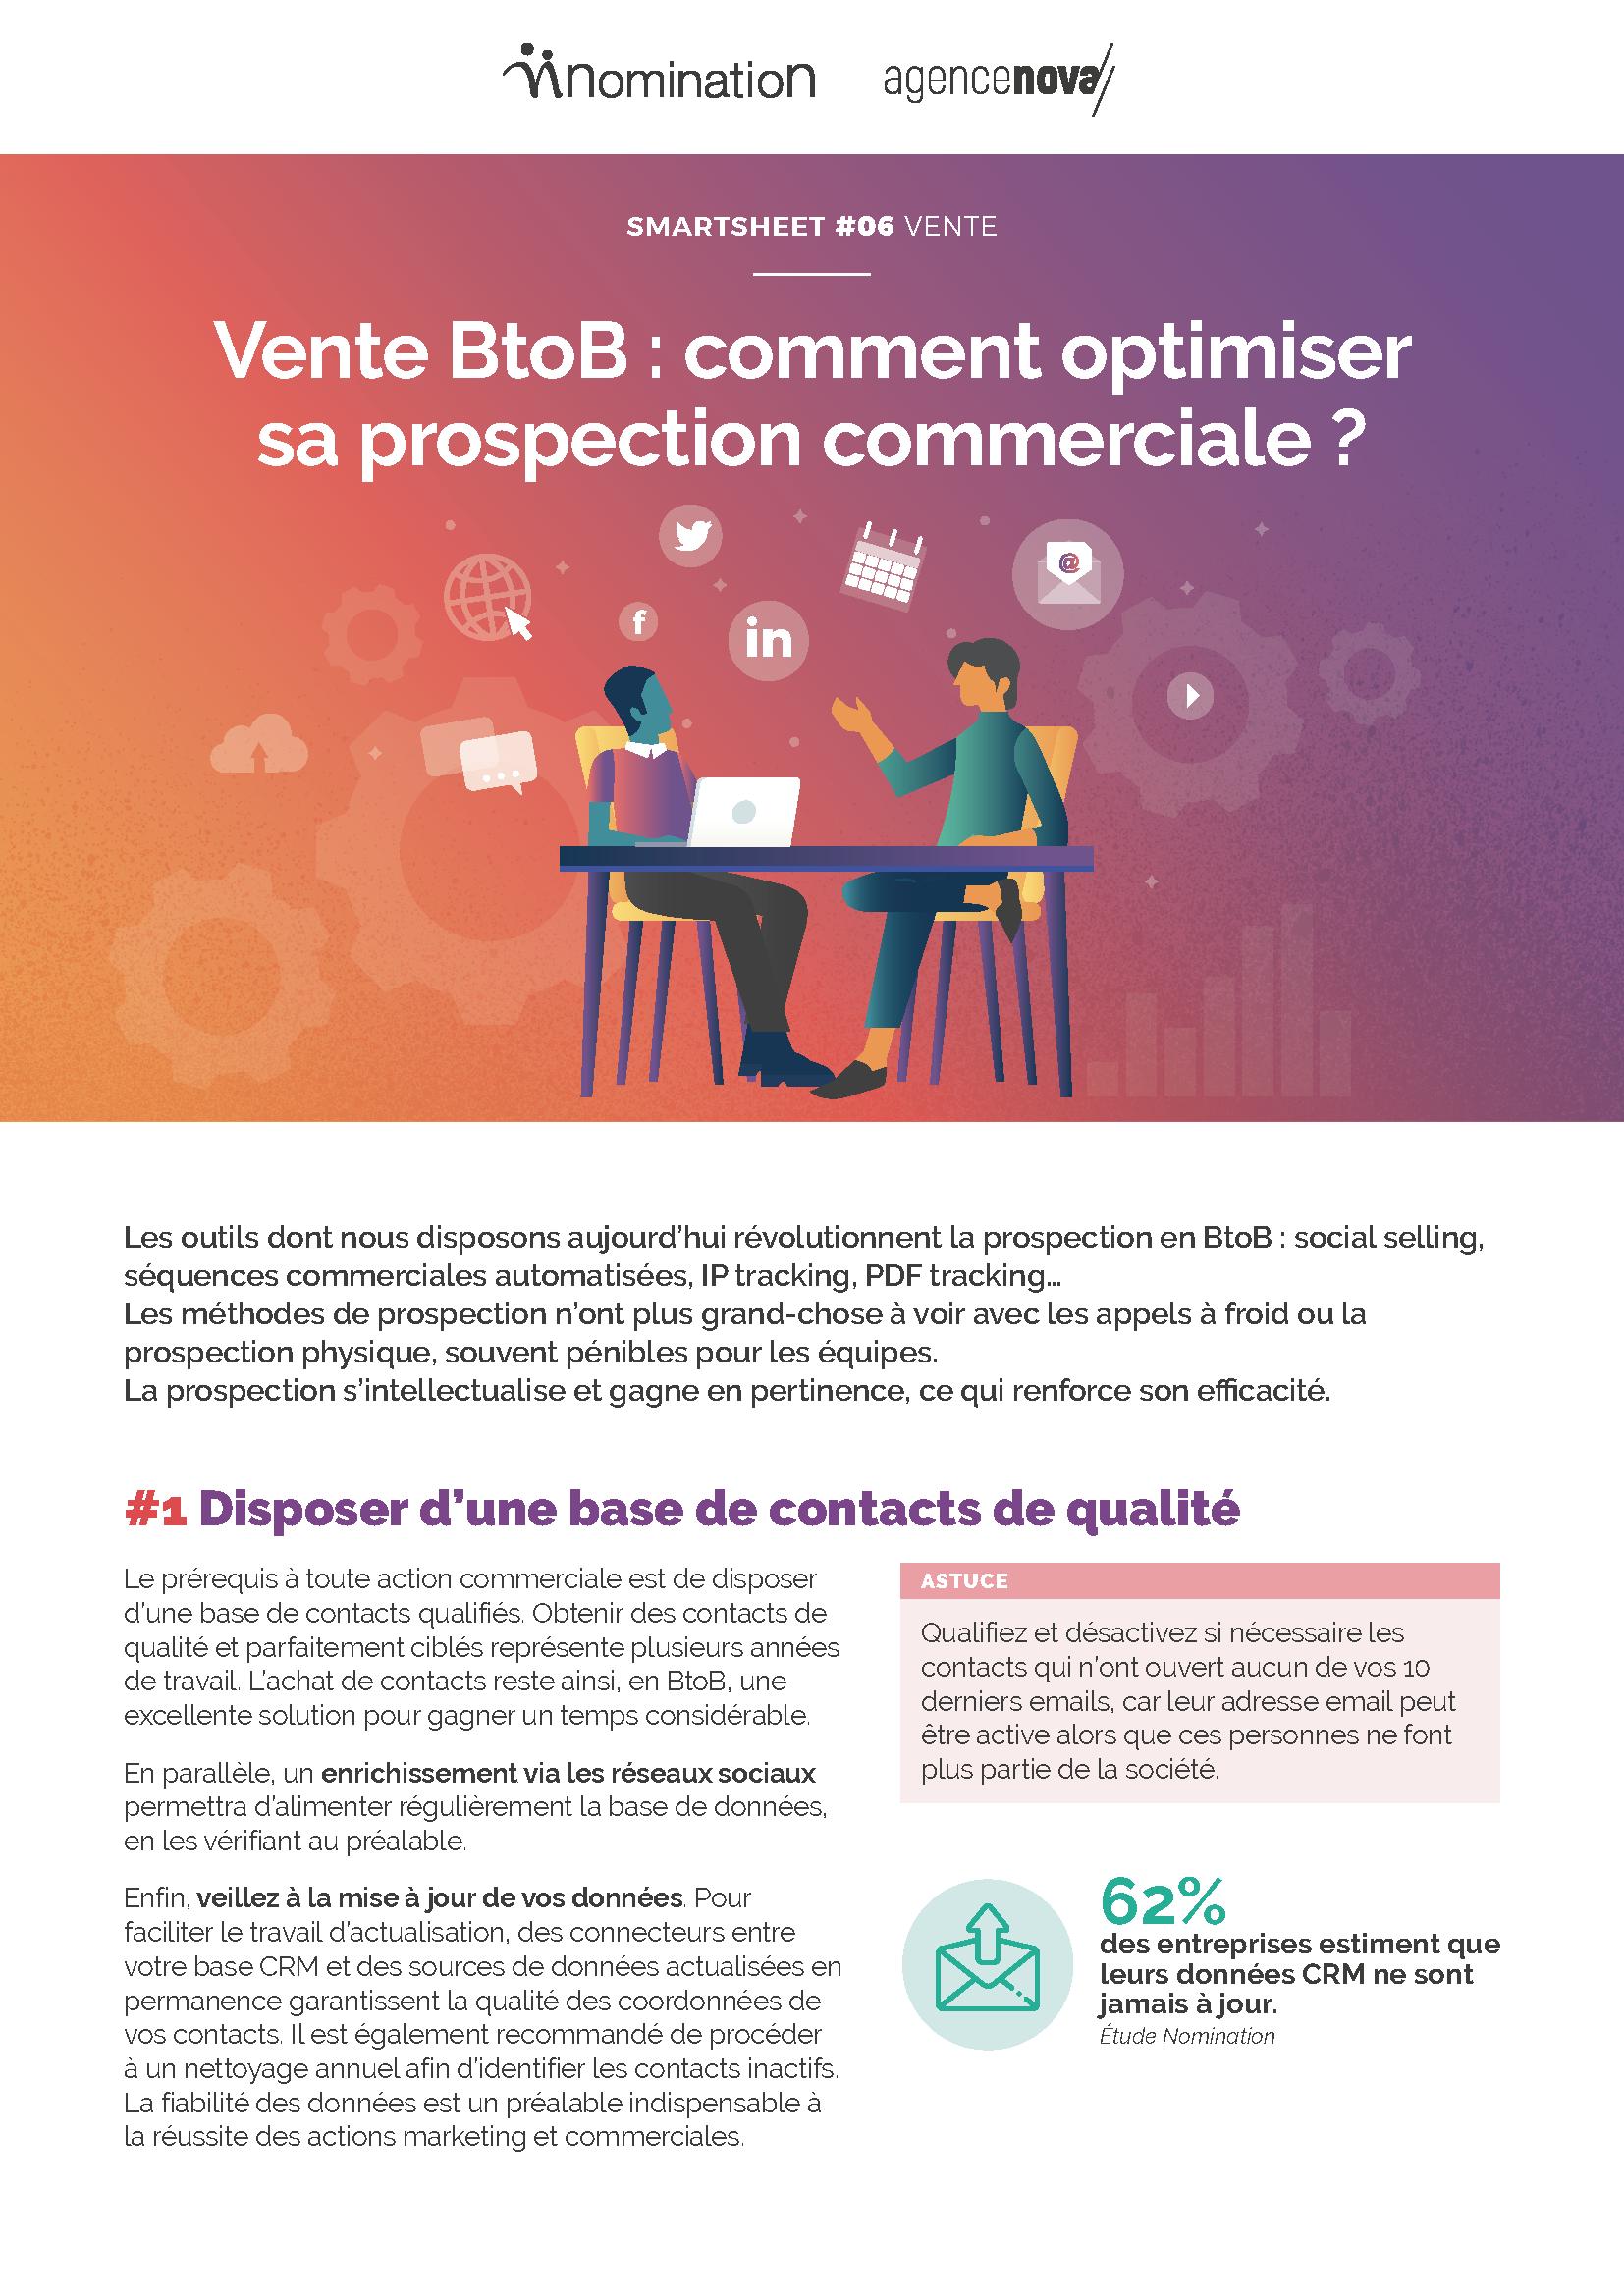 Agence Nova - SmartSheet6 v3 RECTO